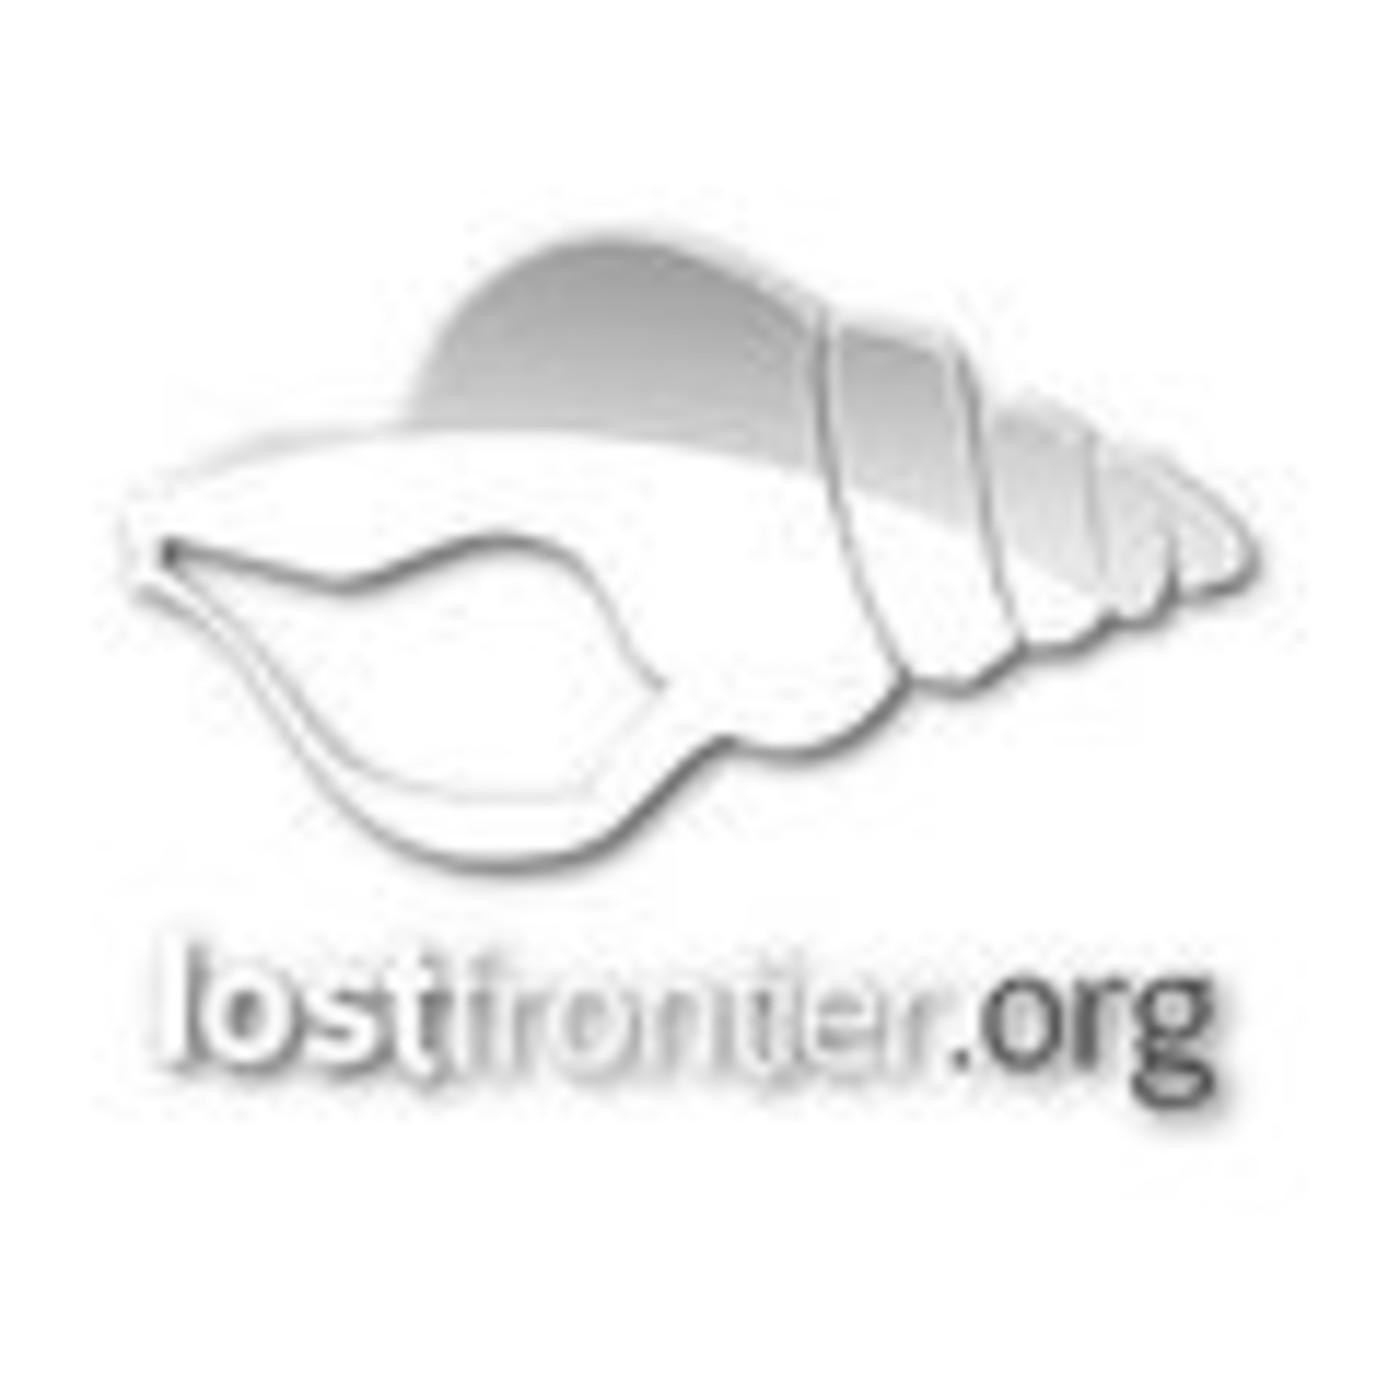 lostfrontier